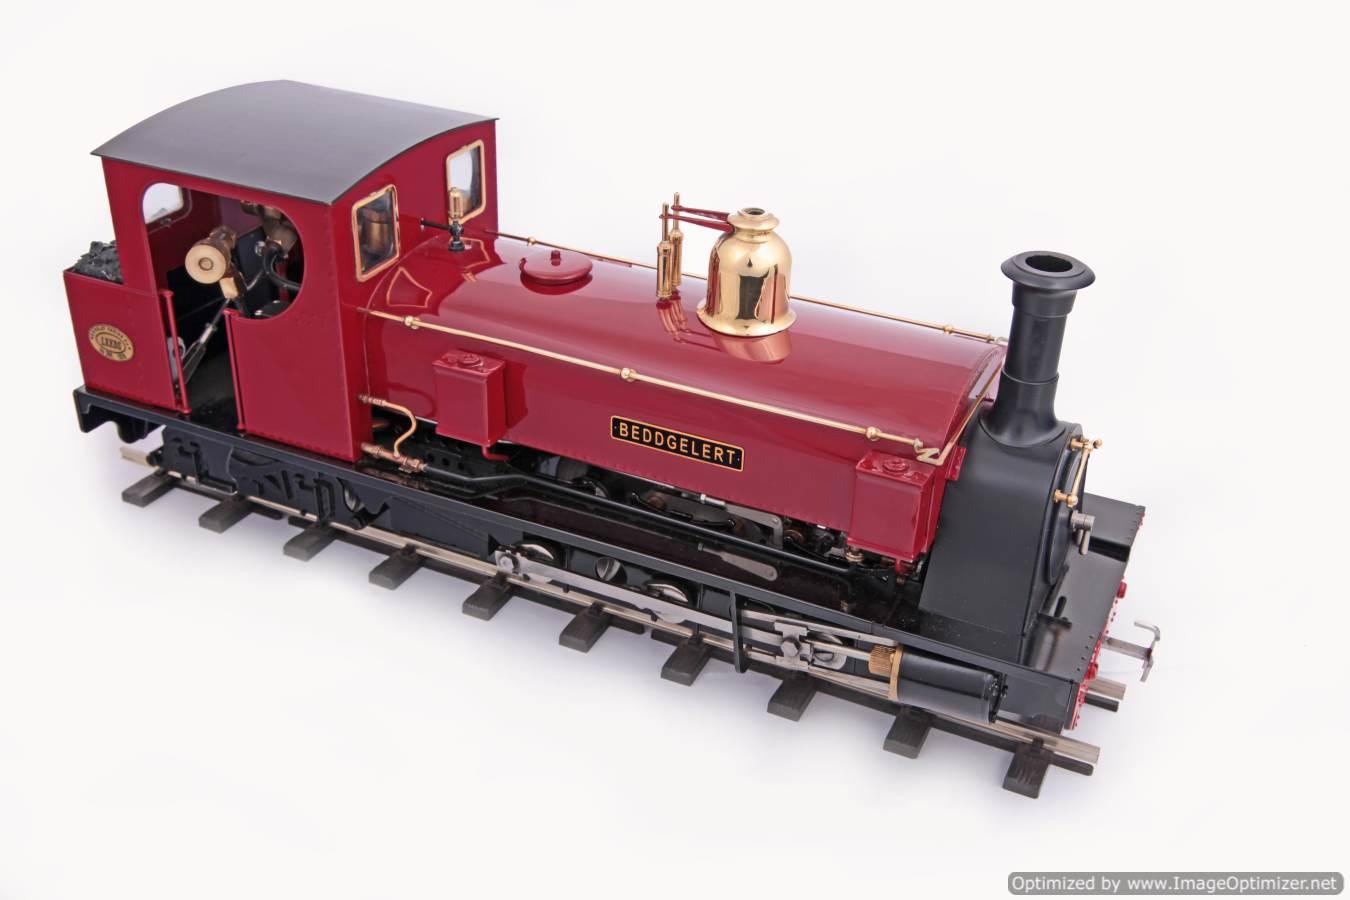 test Beddgelert 0-6-4ST Hunslet Locomotive Company Roundhouse 04 Optimized